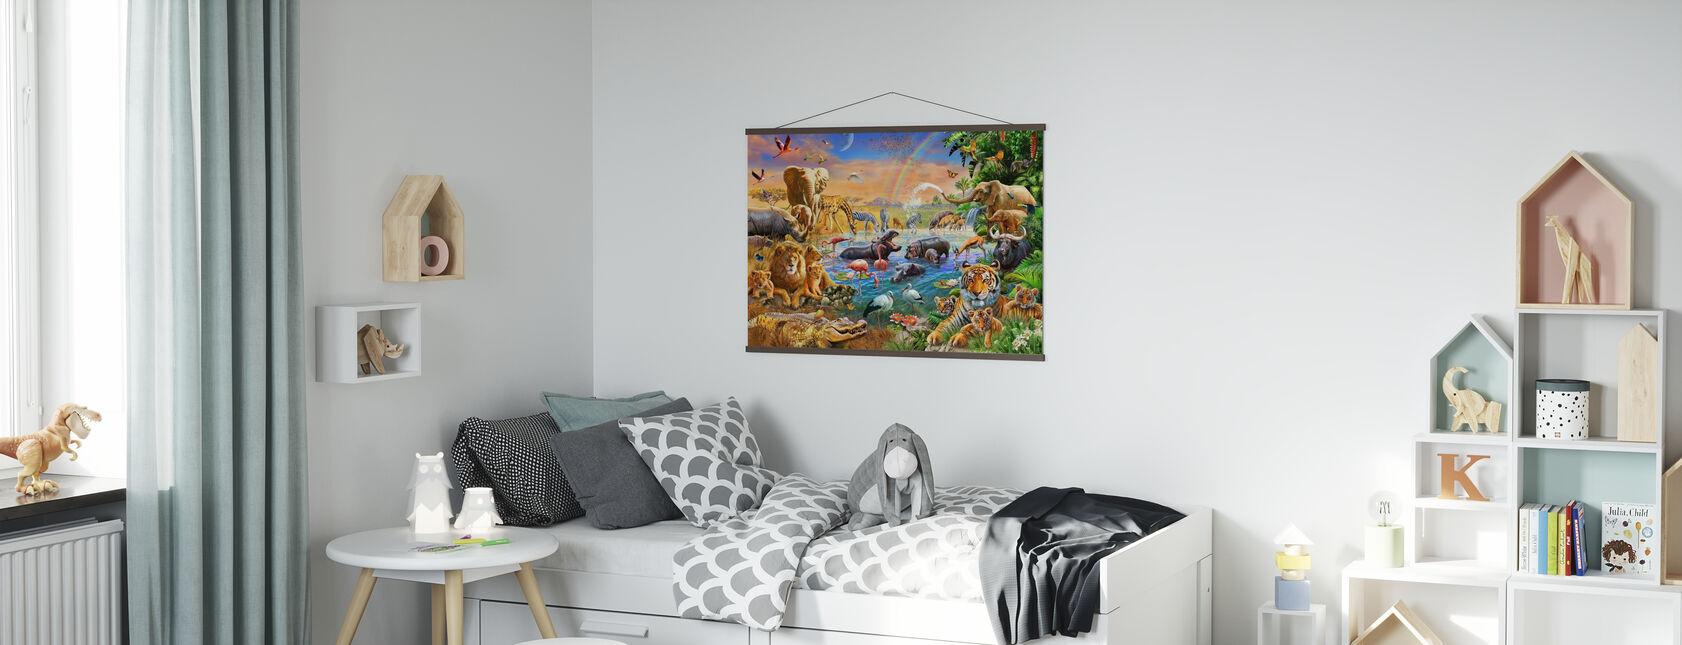 Savannah Jungle Waterhole - Poster - Kids Room